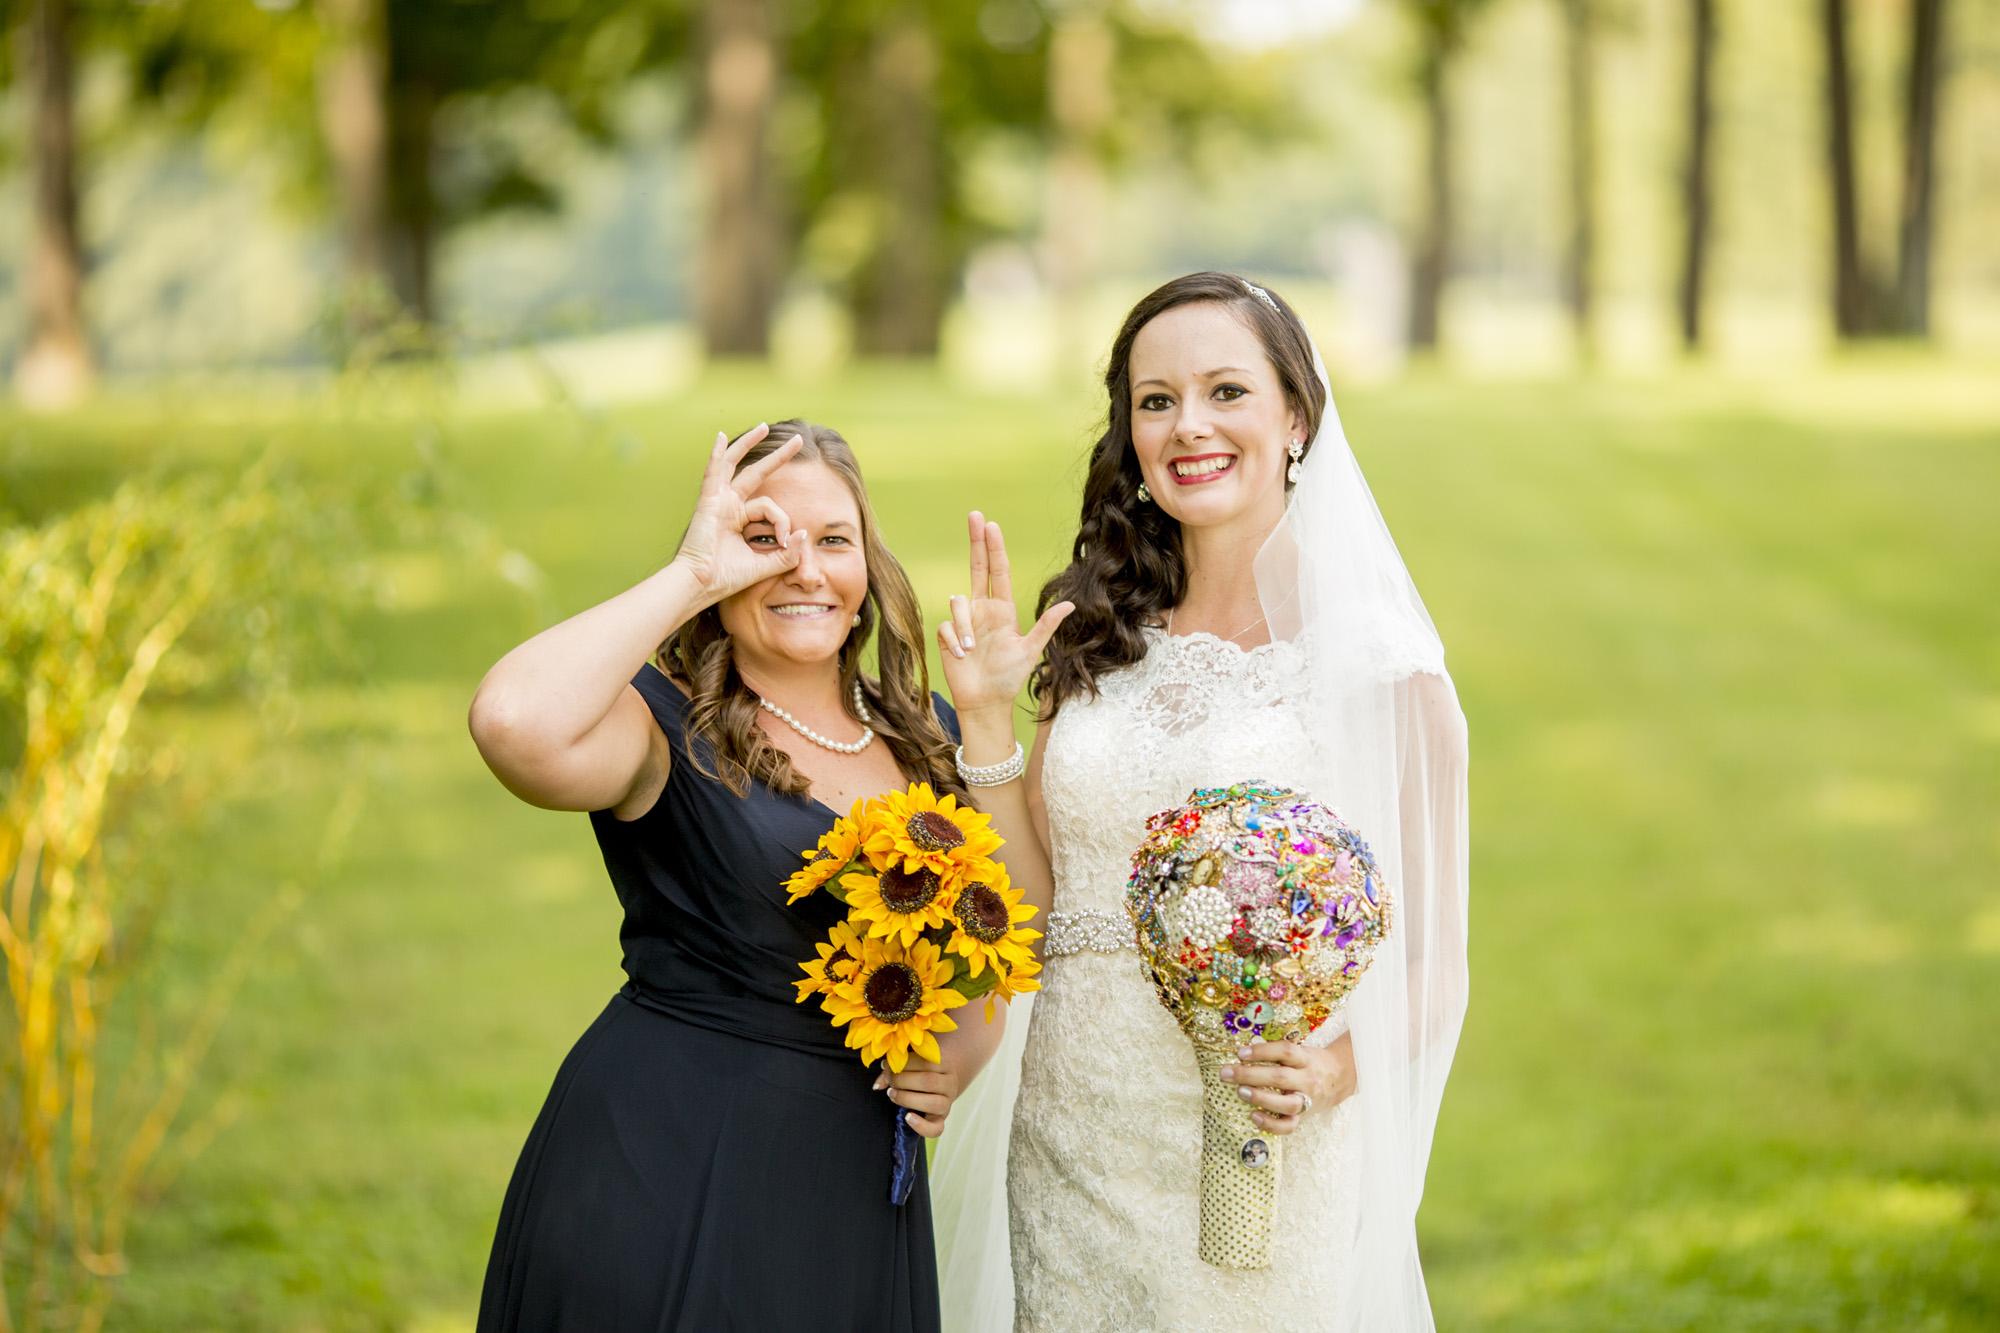 Seriously_Sabrina_Photography_Bowling_Green_Kentucky_Highland_Stables_Wedding_Wolff57.jpg